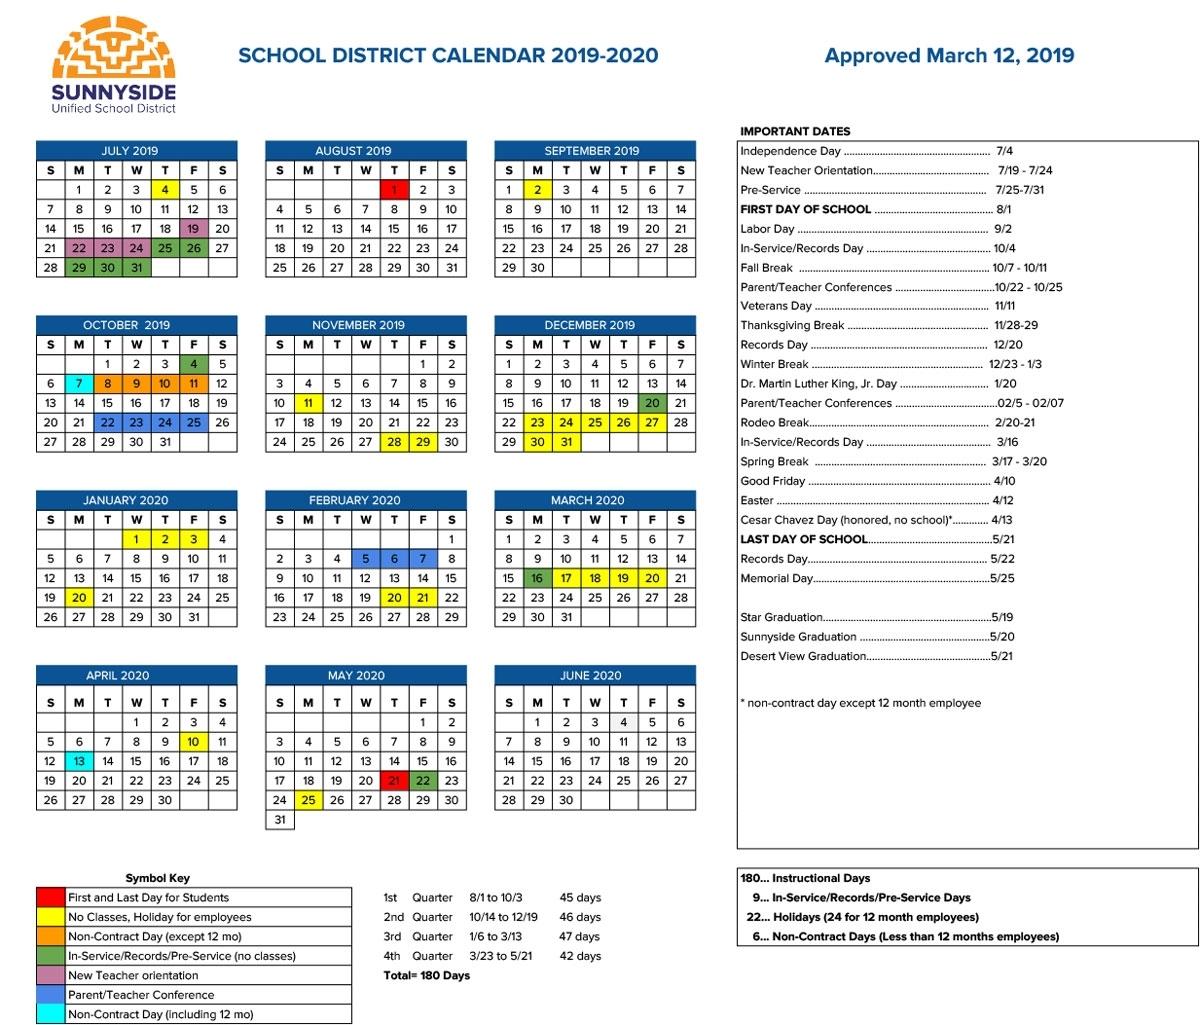 Academic Calendar   Sunnyside Unified School District pertaining to 2019-2020 Special Calendar Days